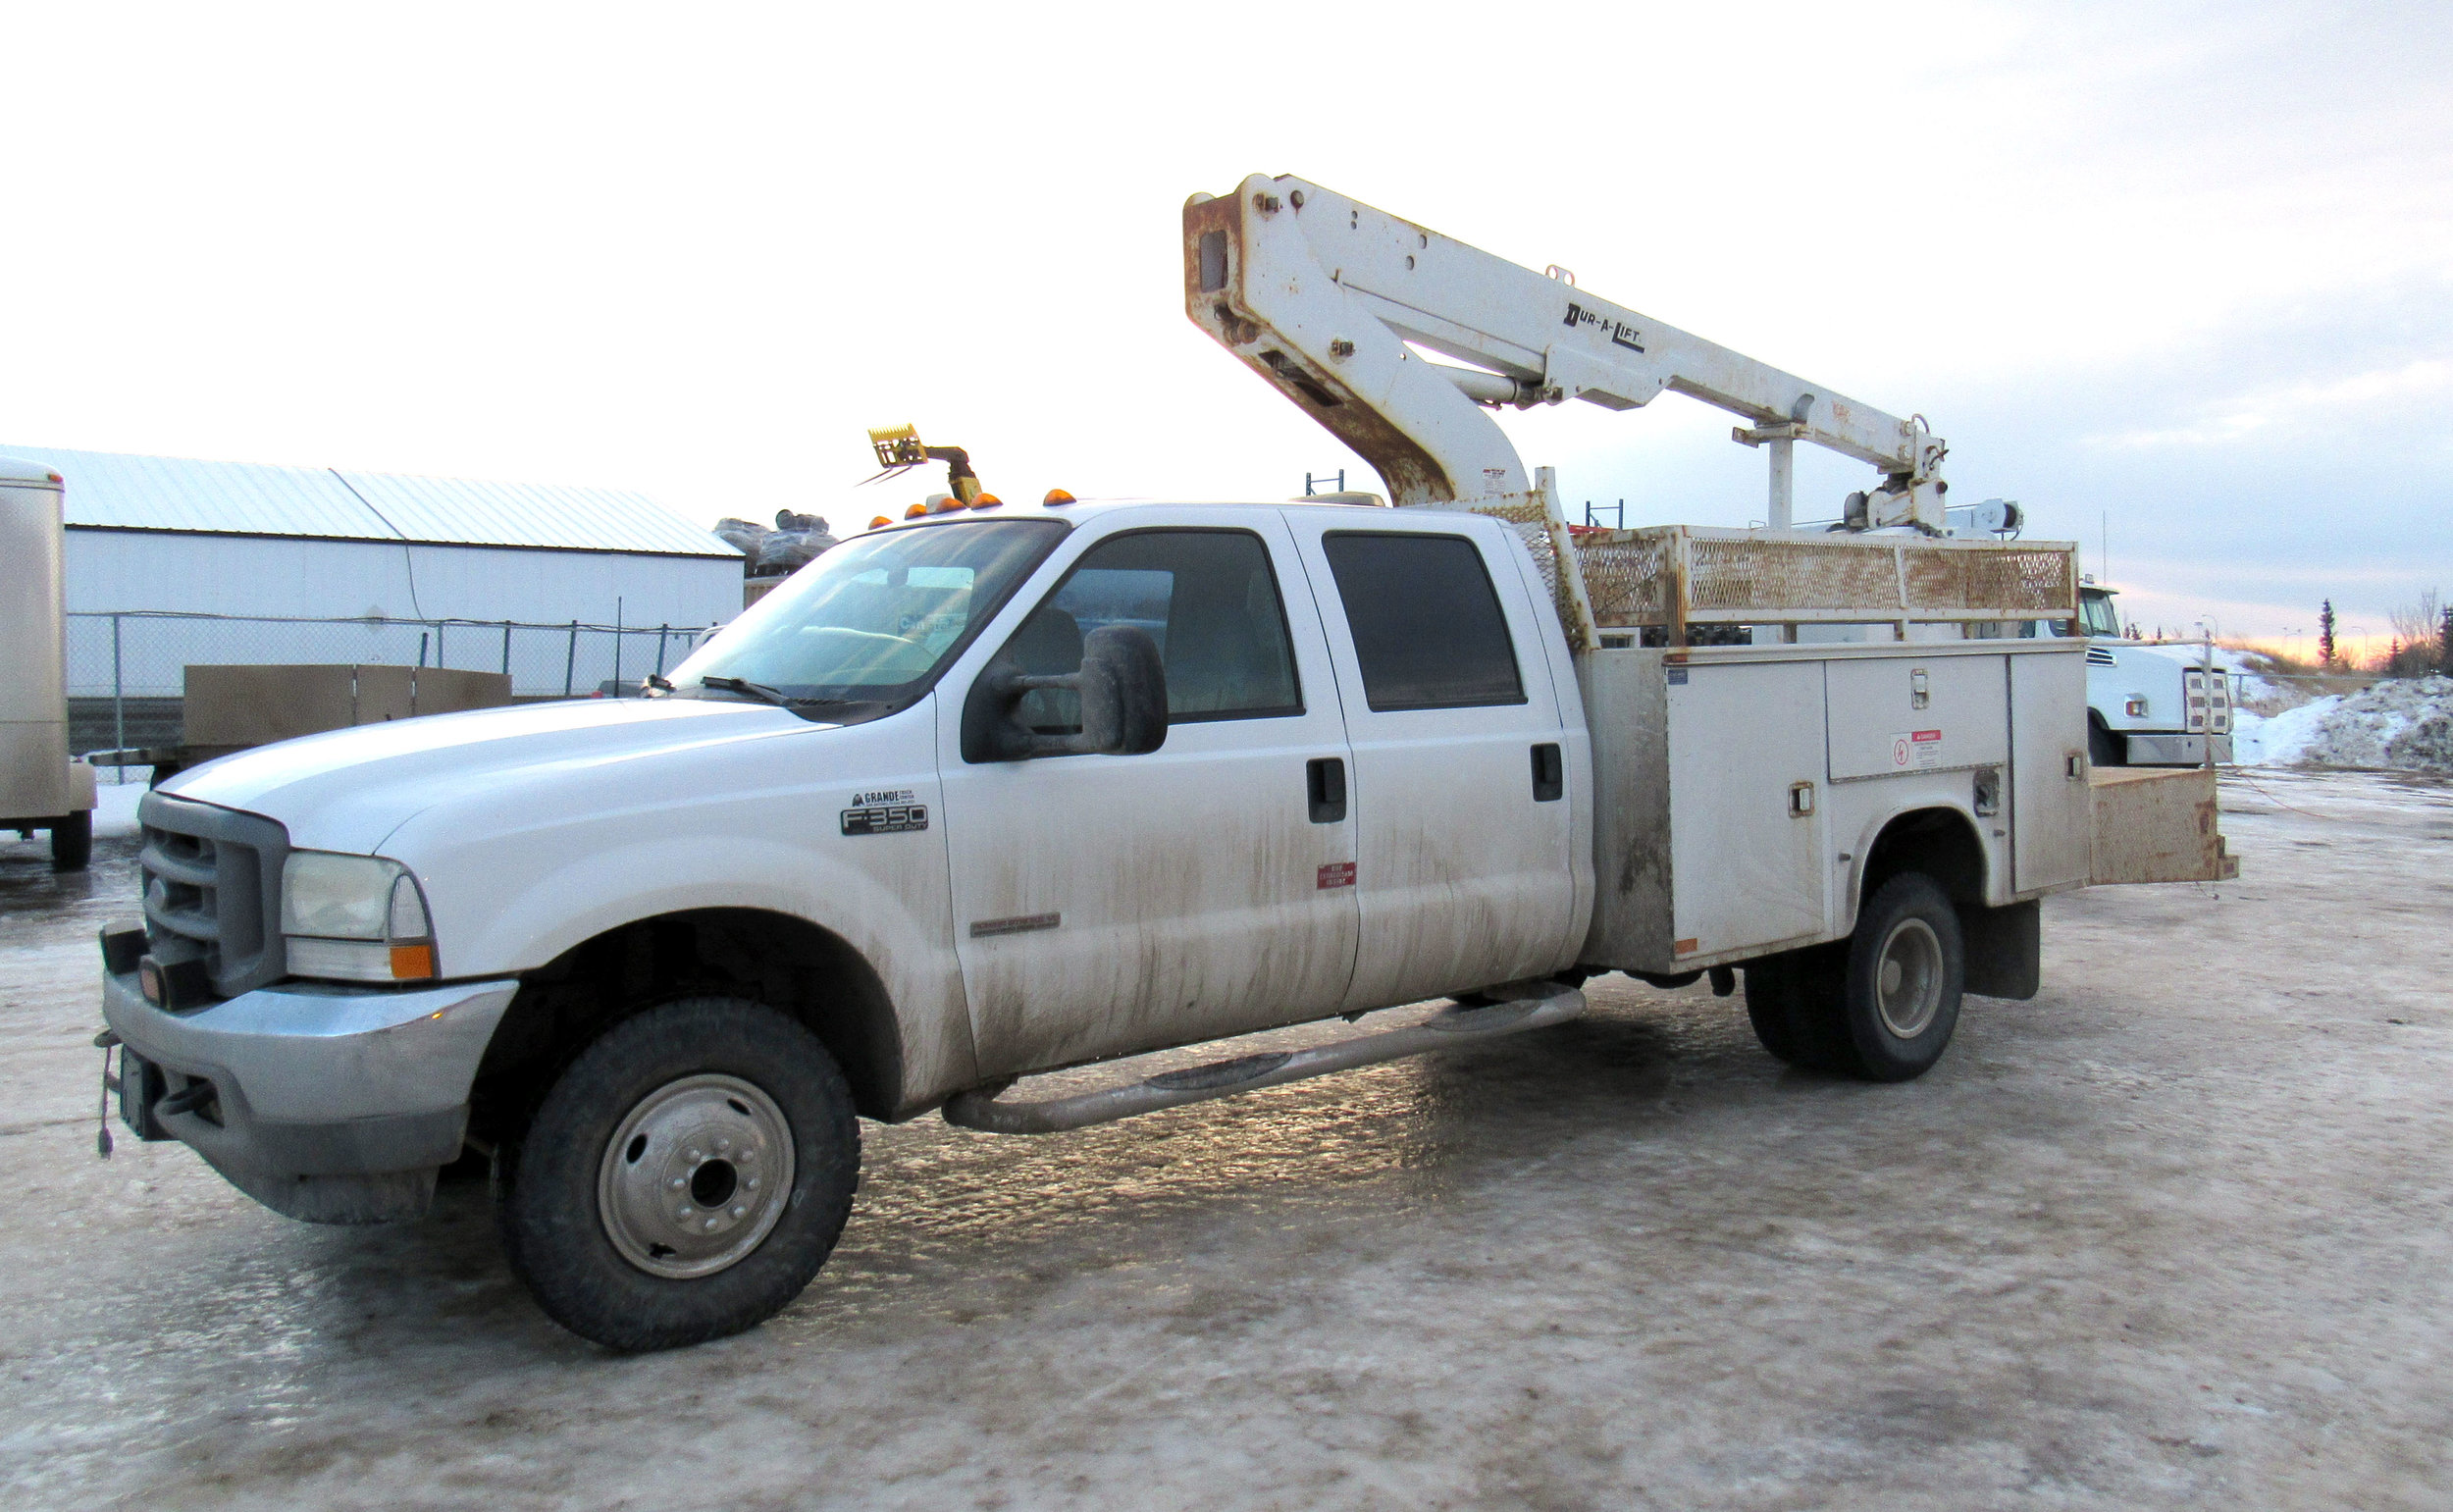 Lan Tech Services Grande Prairie Alberta Commercial Equipment Rental Cable Installation